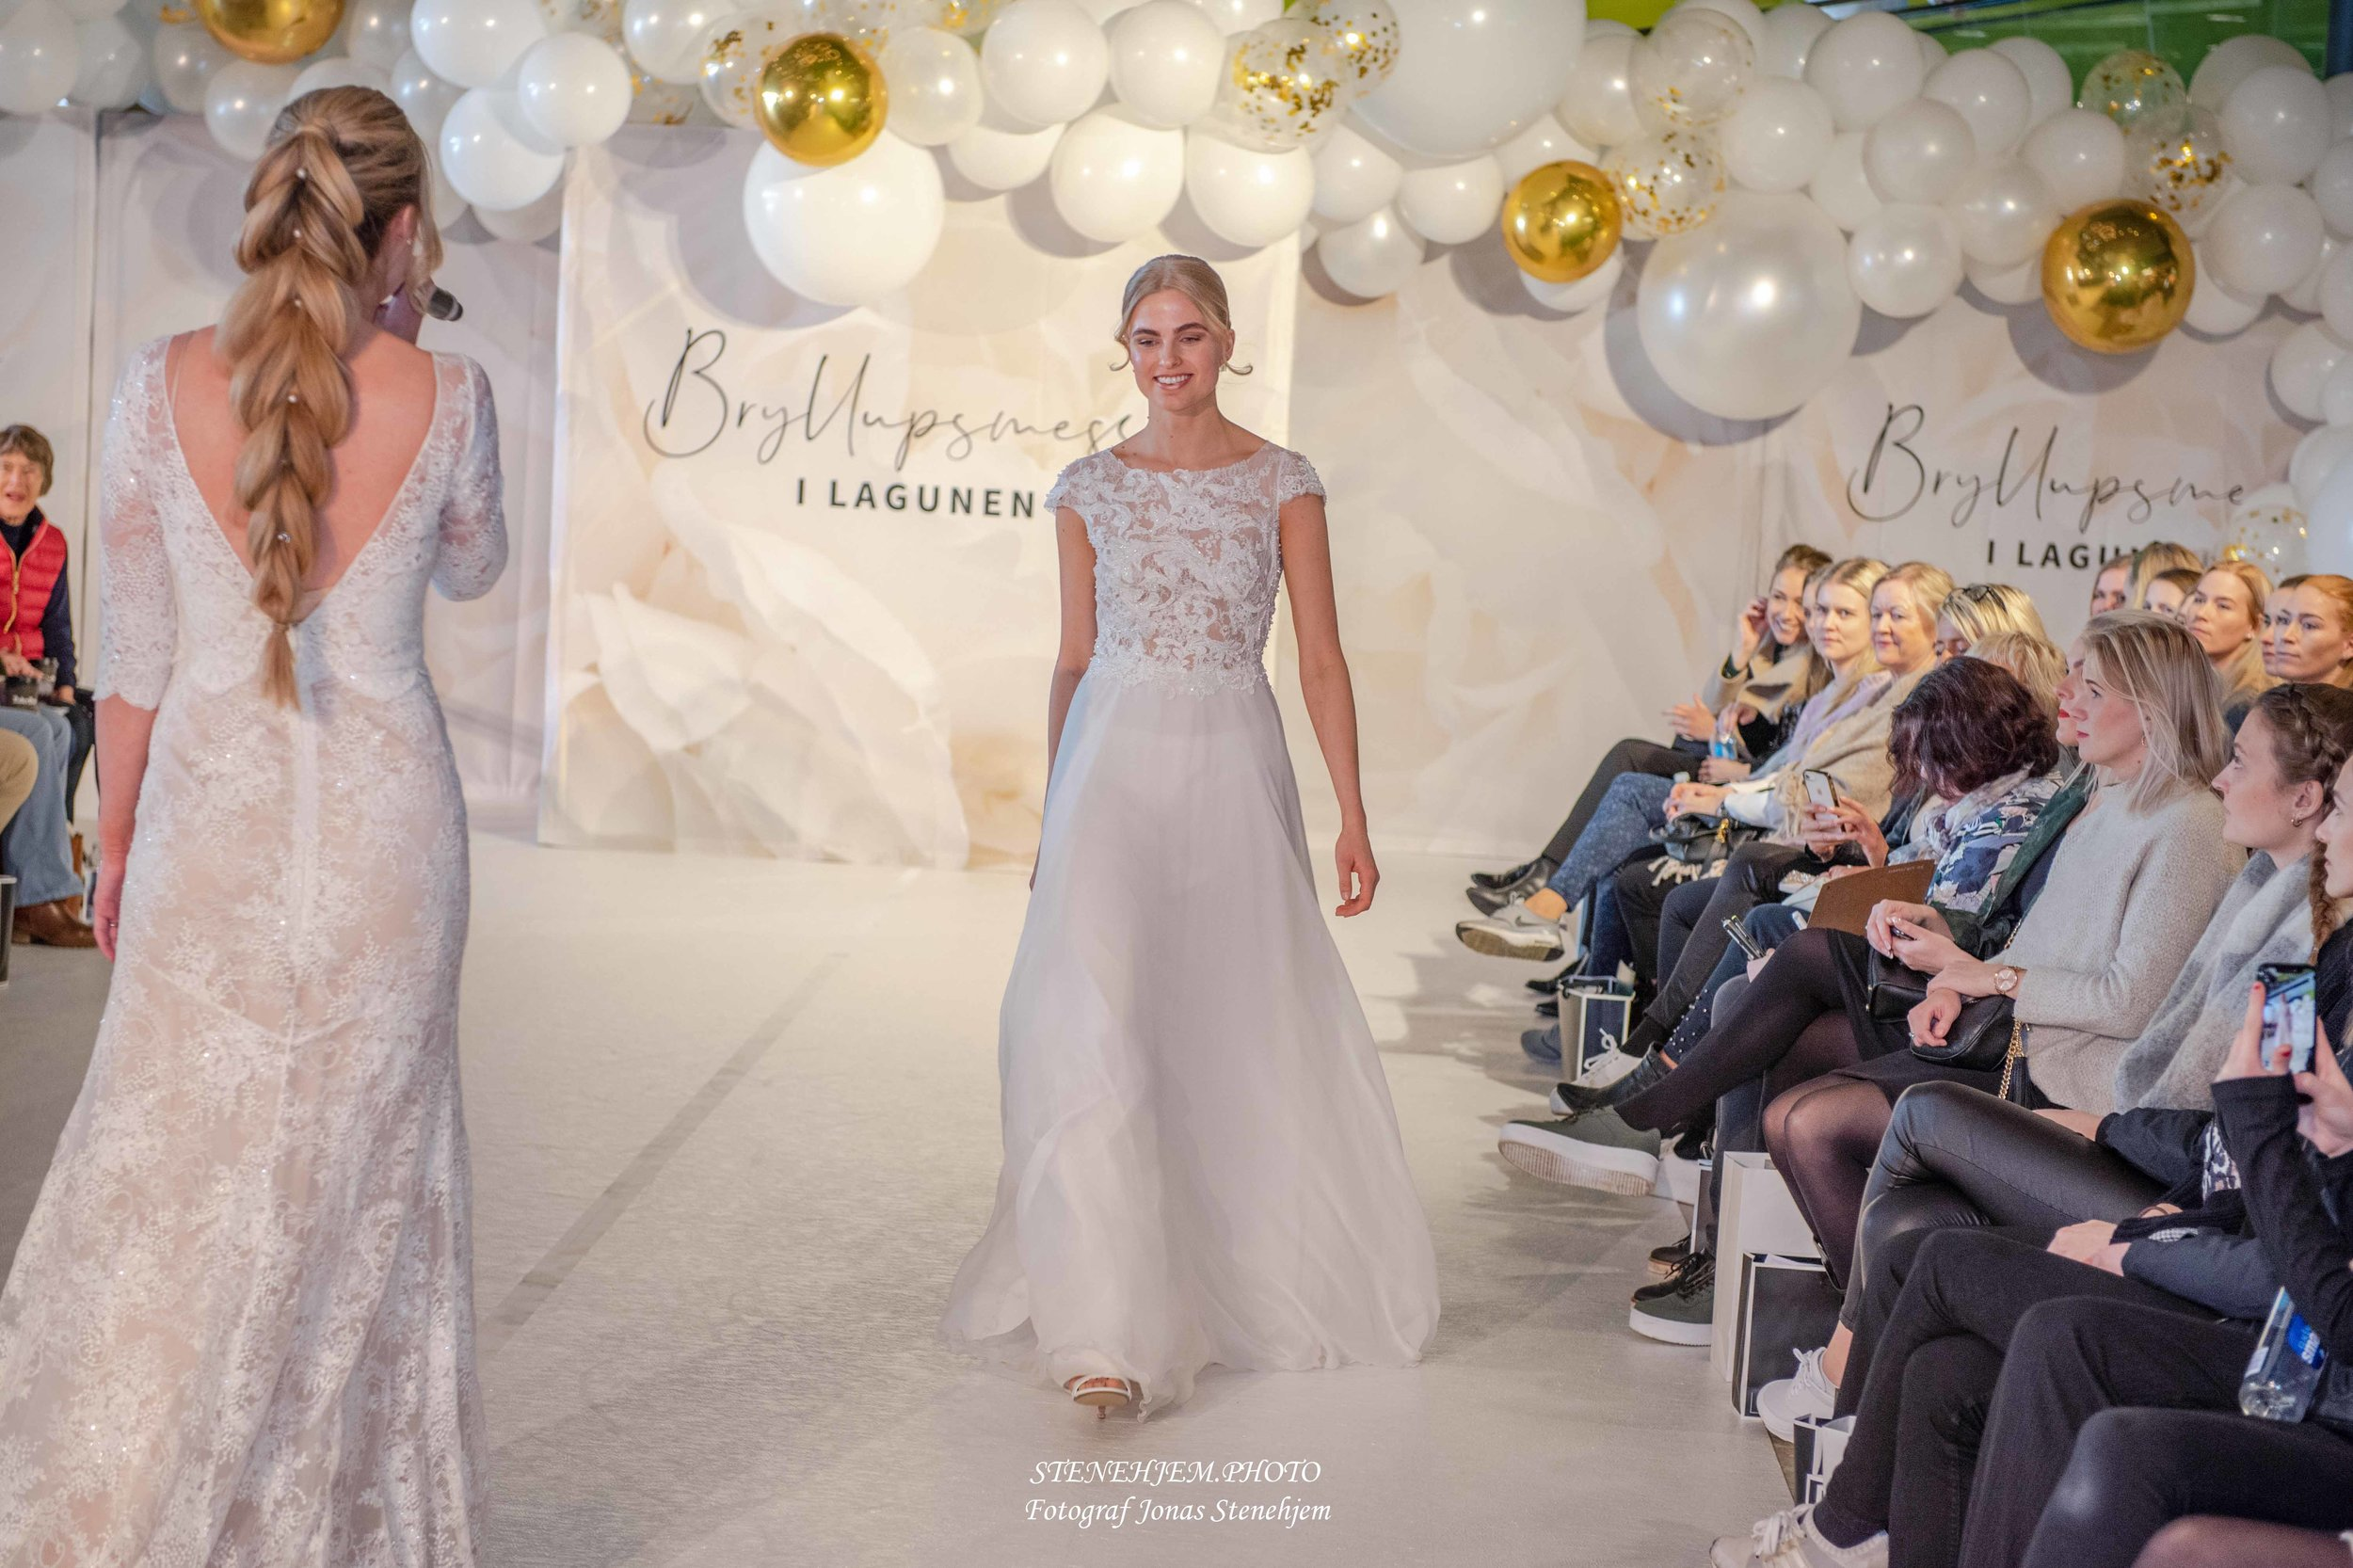 Bryllupsmesse_Lagunen_mittaltweddingfair__020.jpg